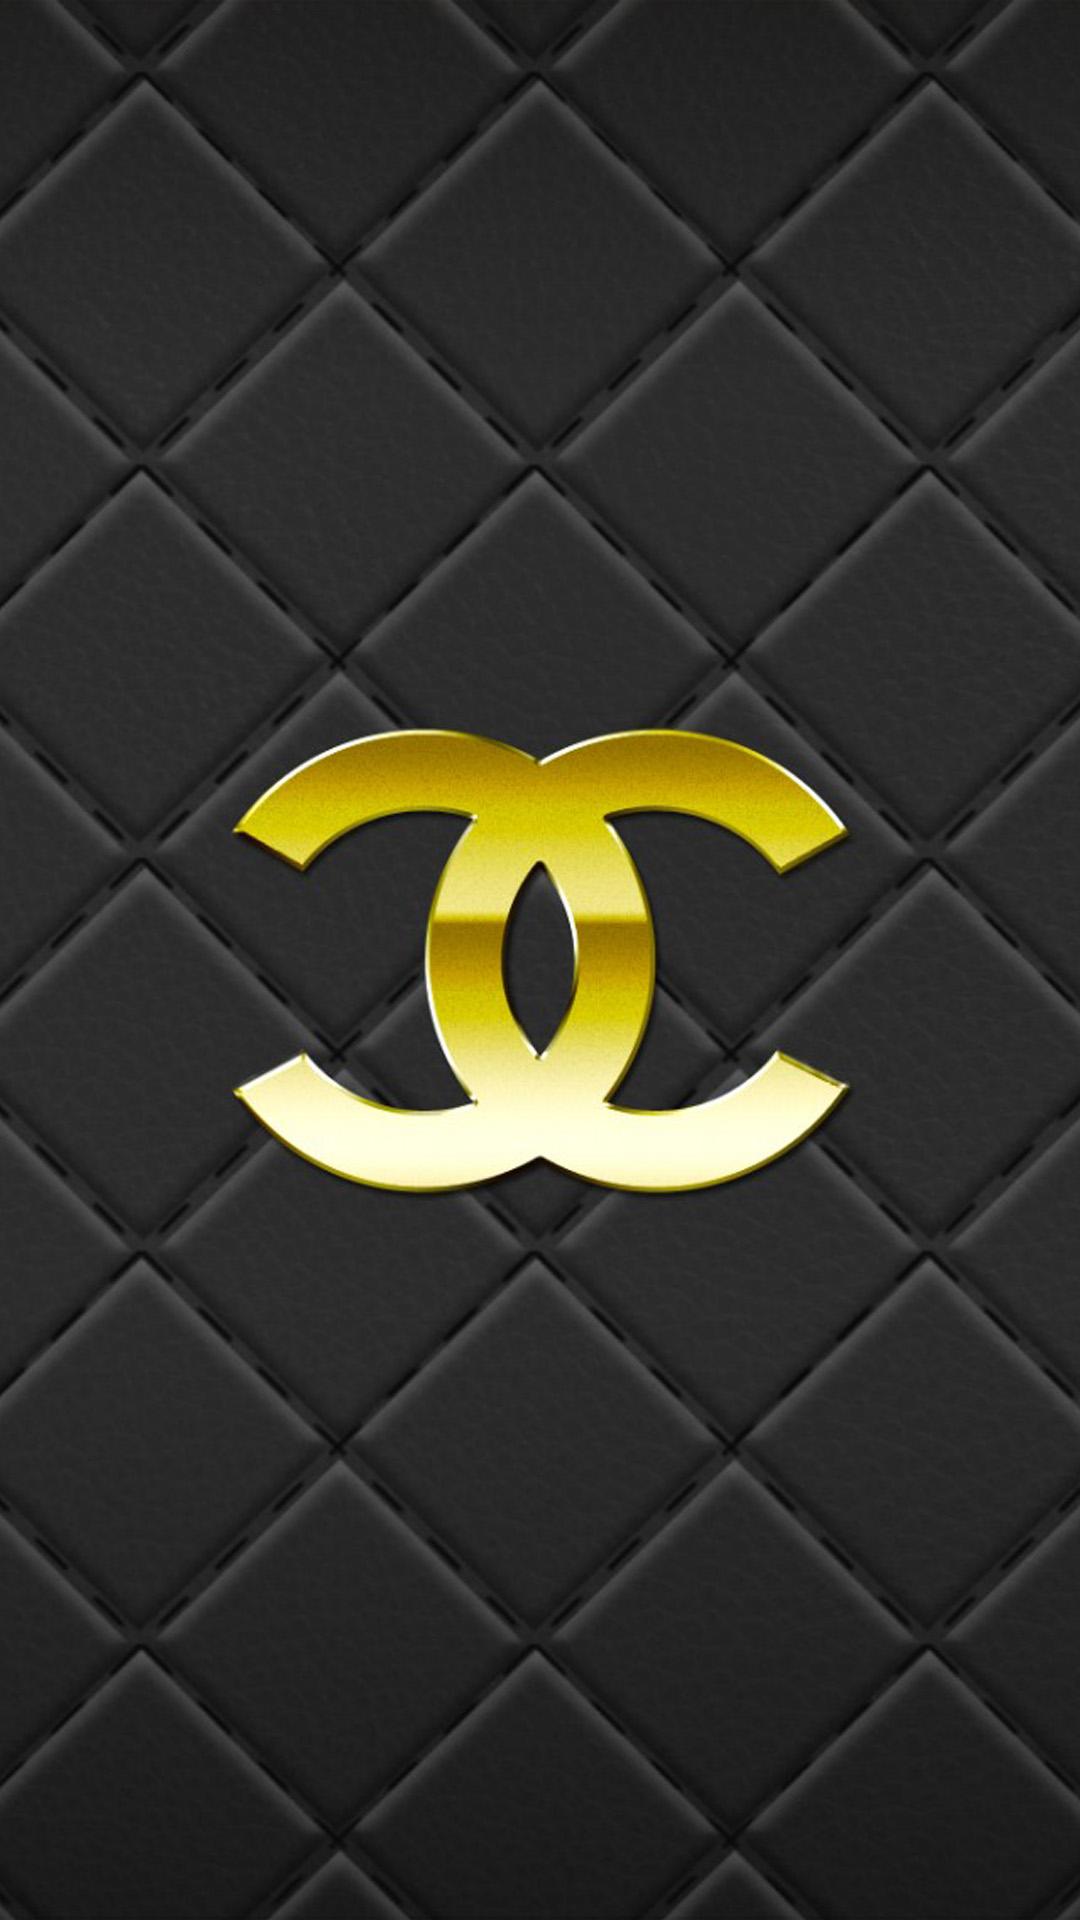 Chanel-logo-Nexus-Nexus-and-Backgrounds-wallpaper-wp5804494